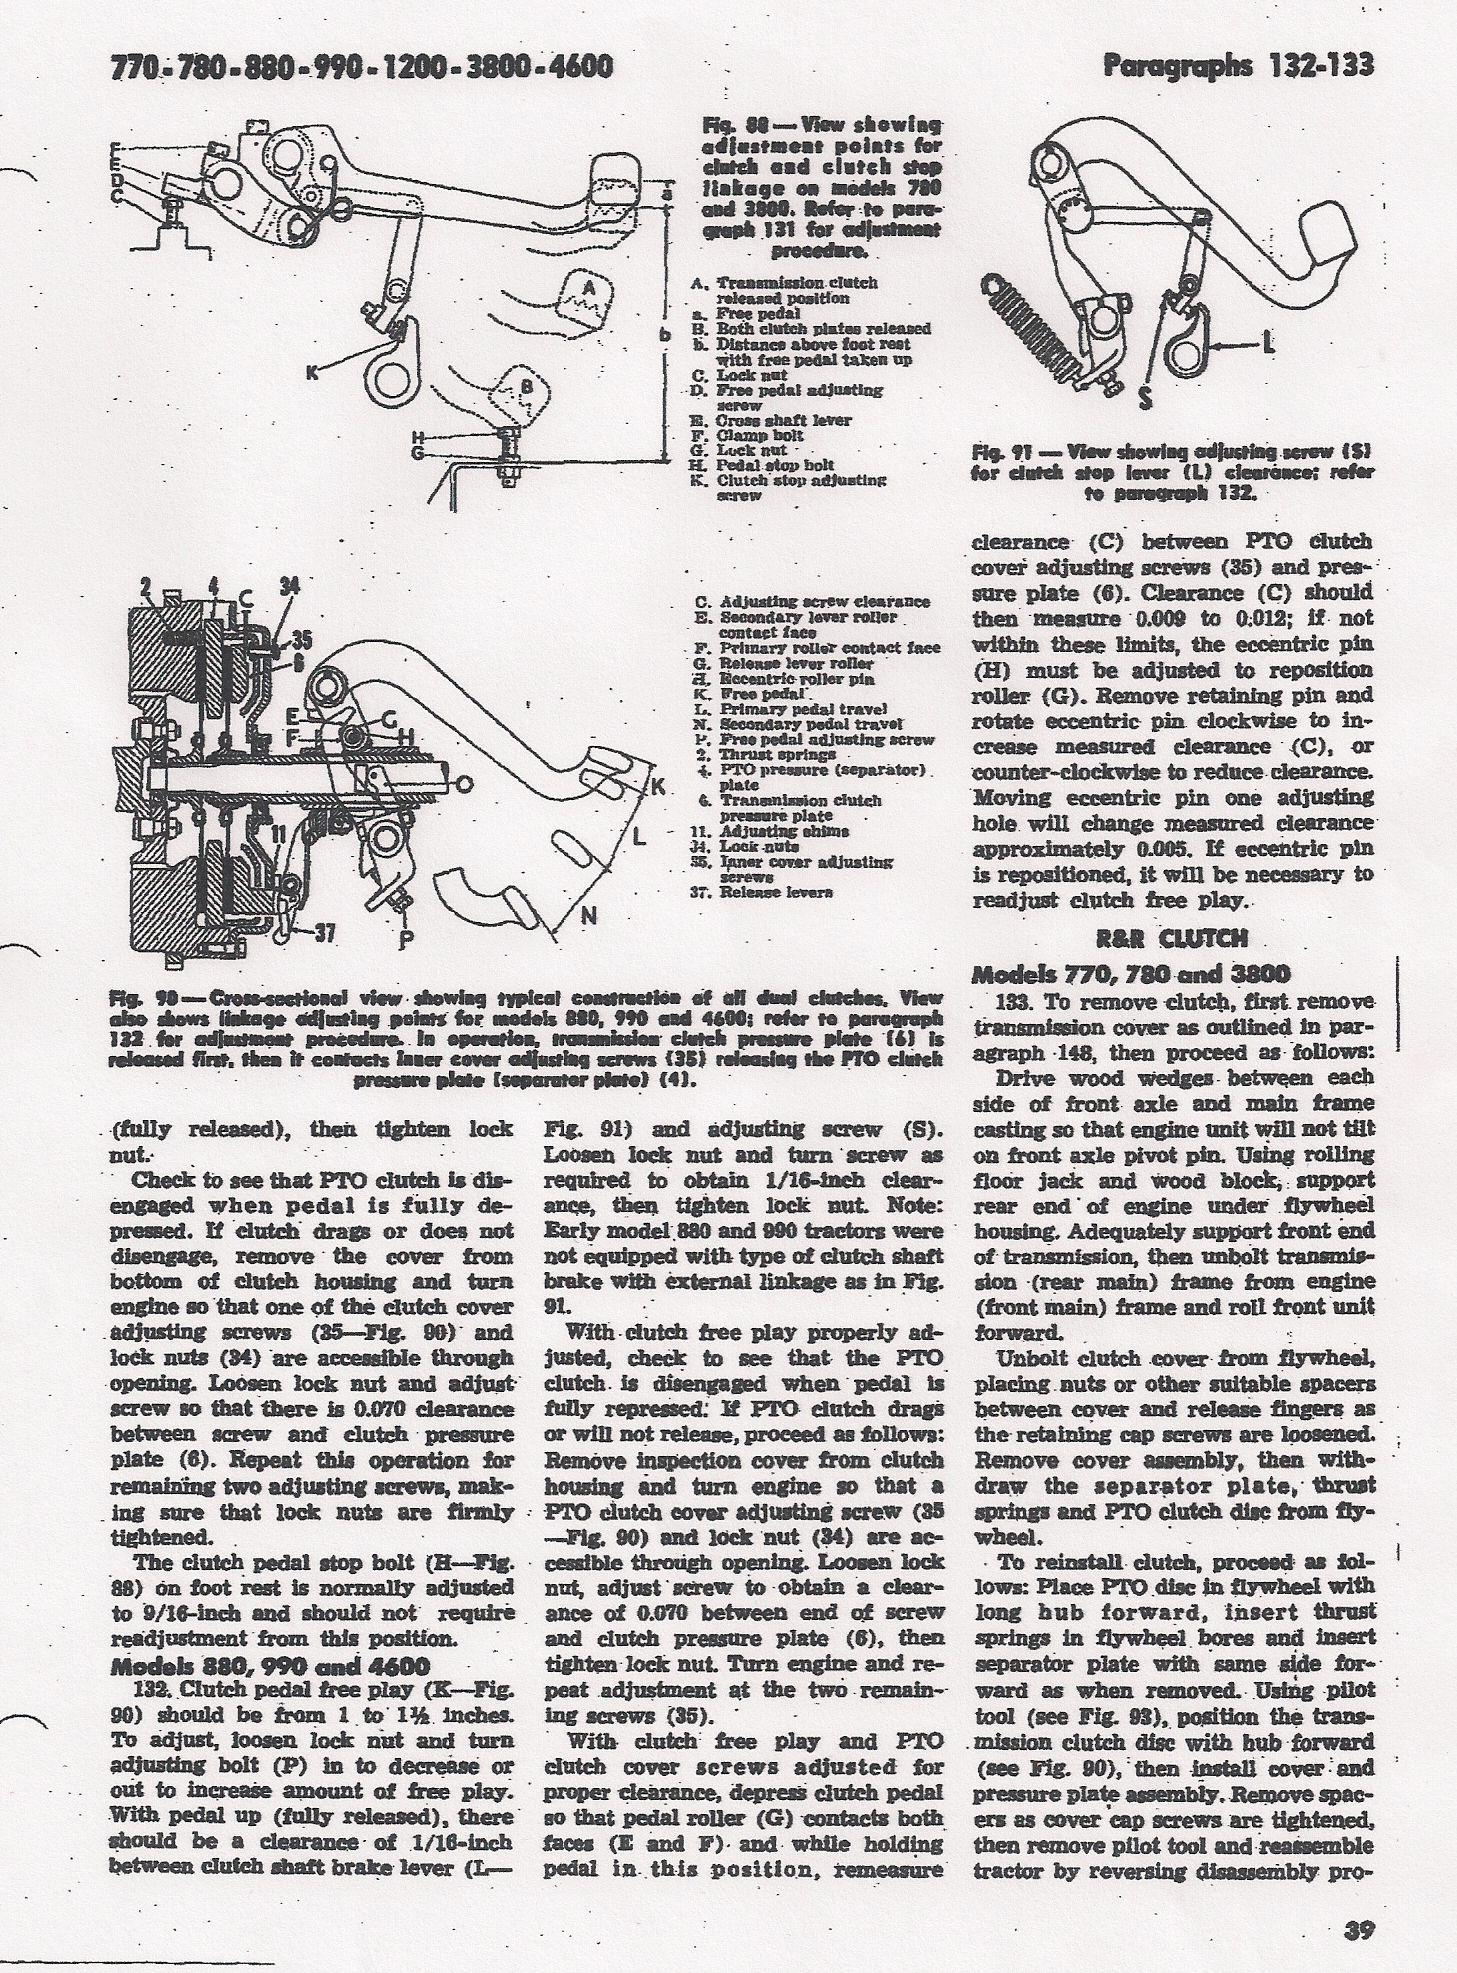 David Brown 780, regulacja sprz�g�a i hamulca skrzyni